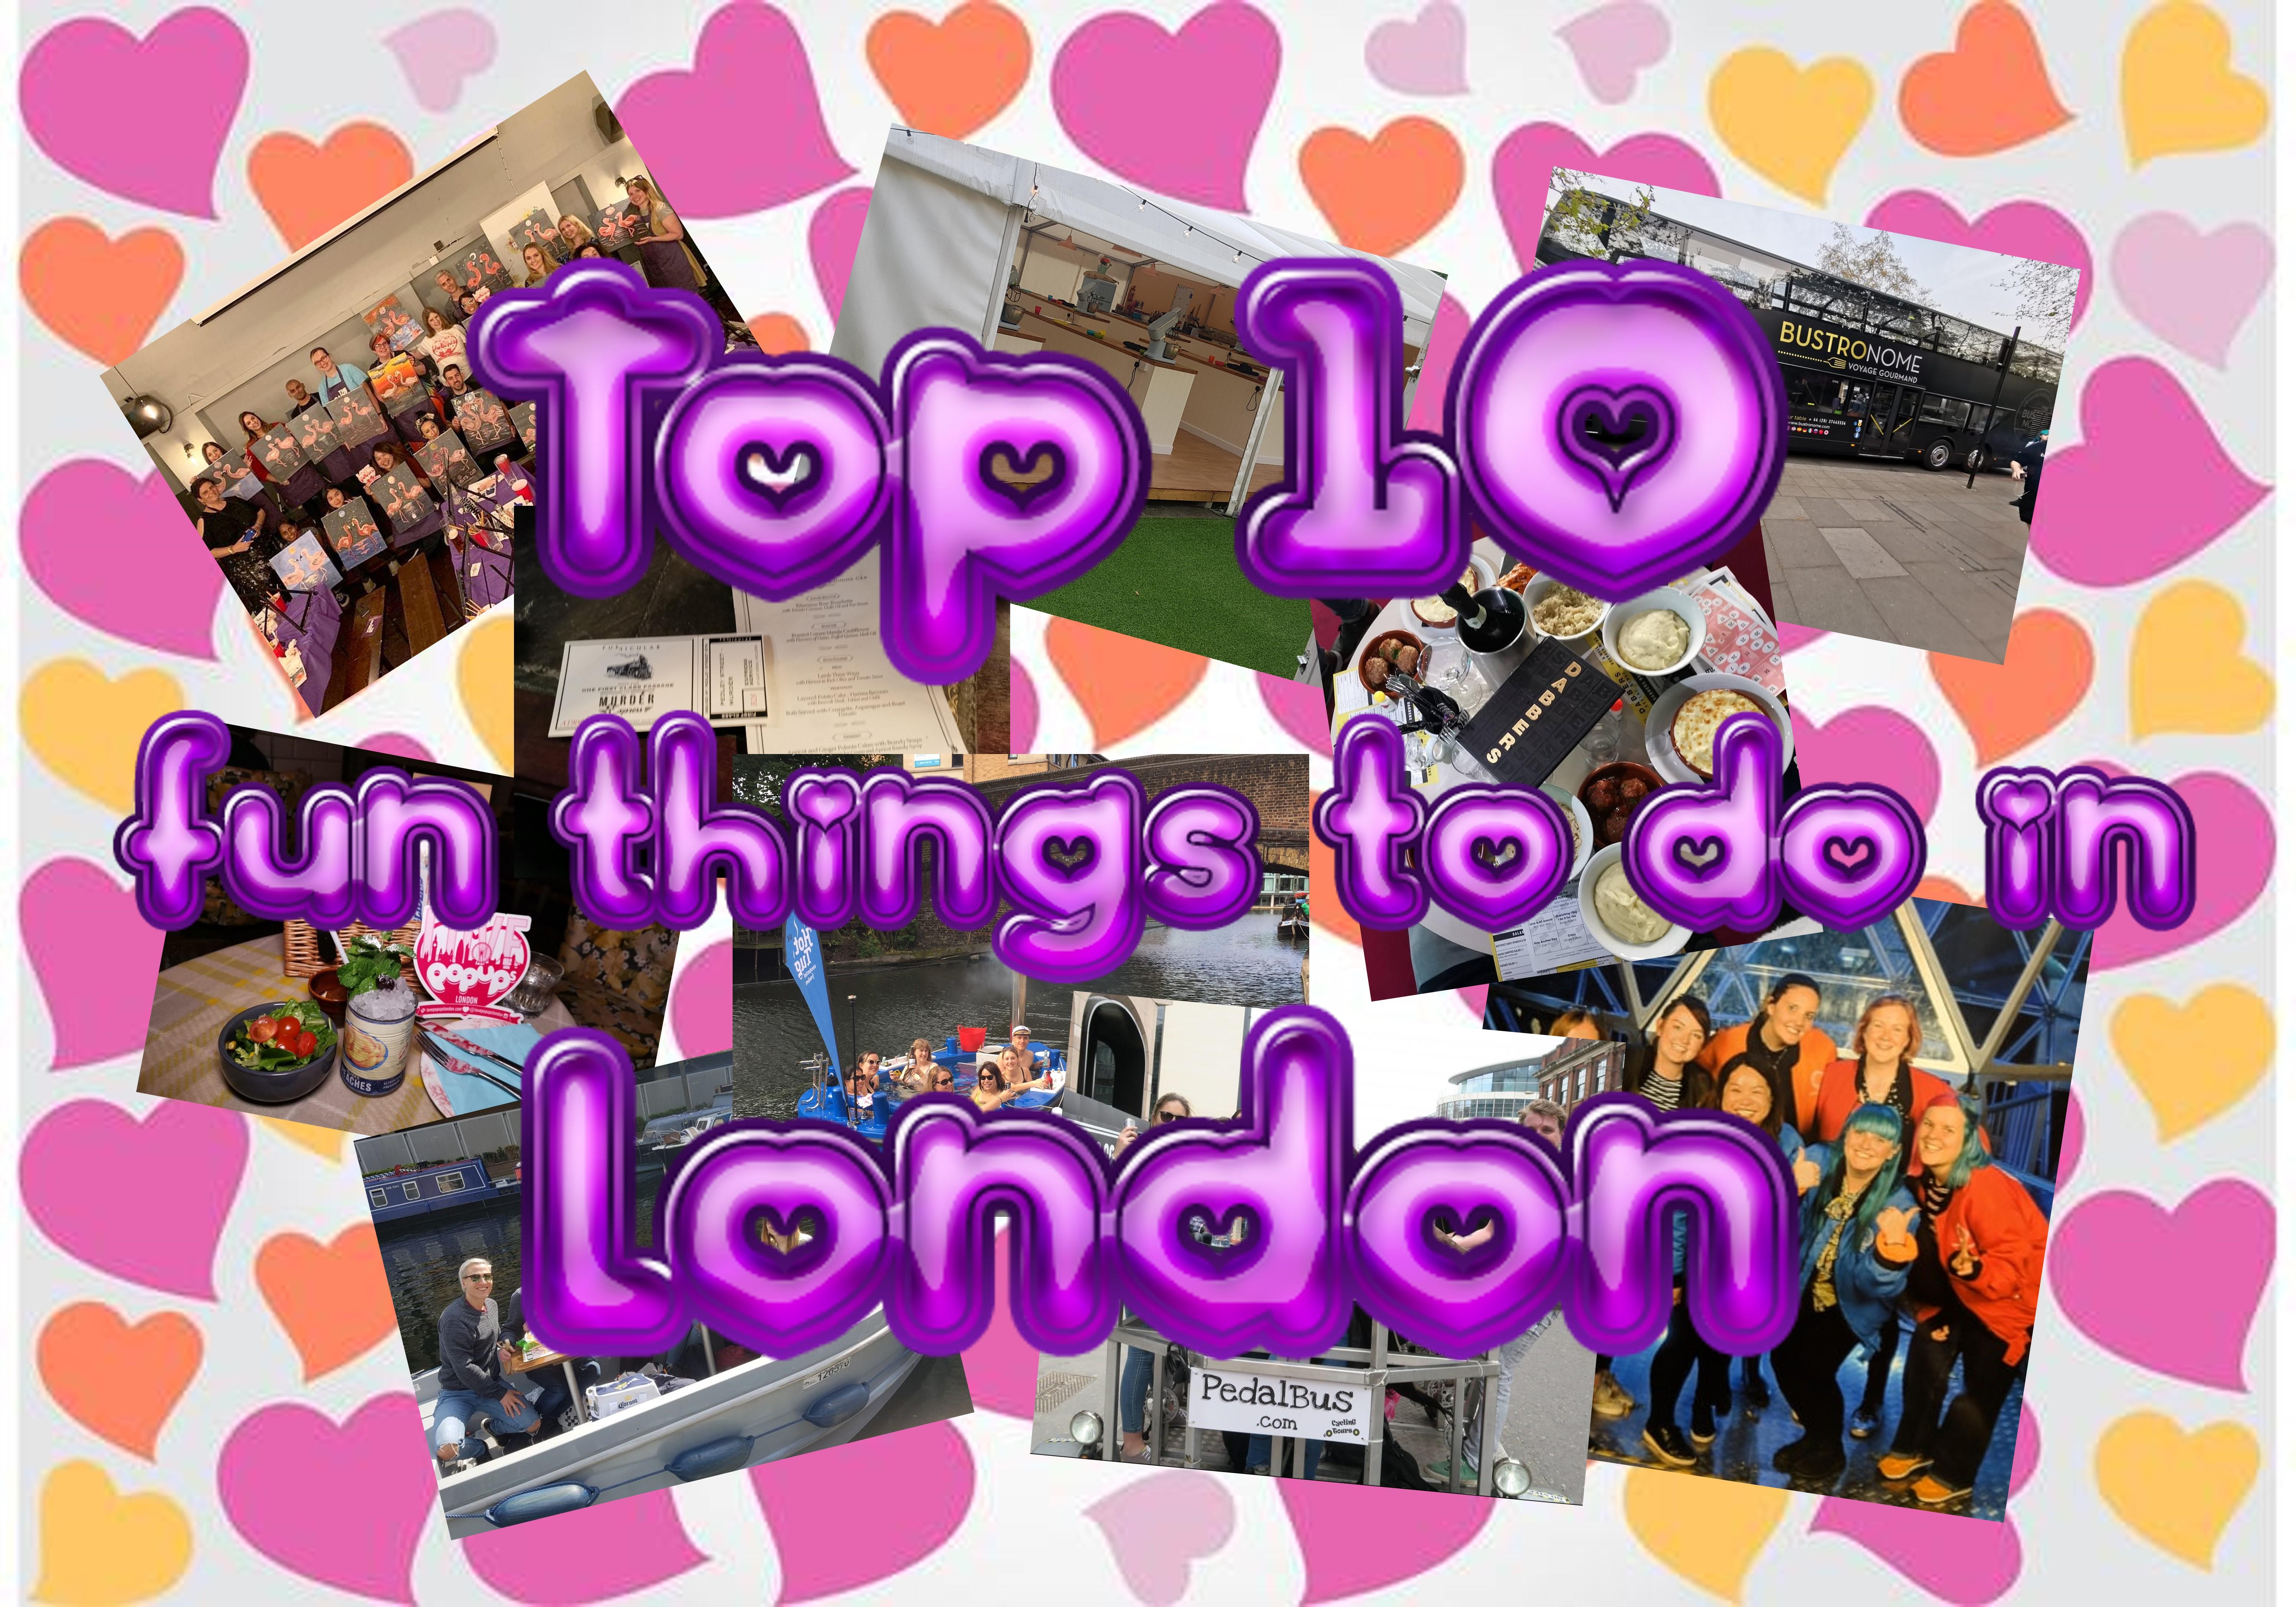 Top 10 Fun Things To Do In London